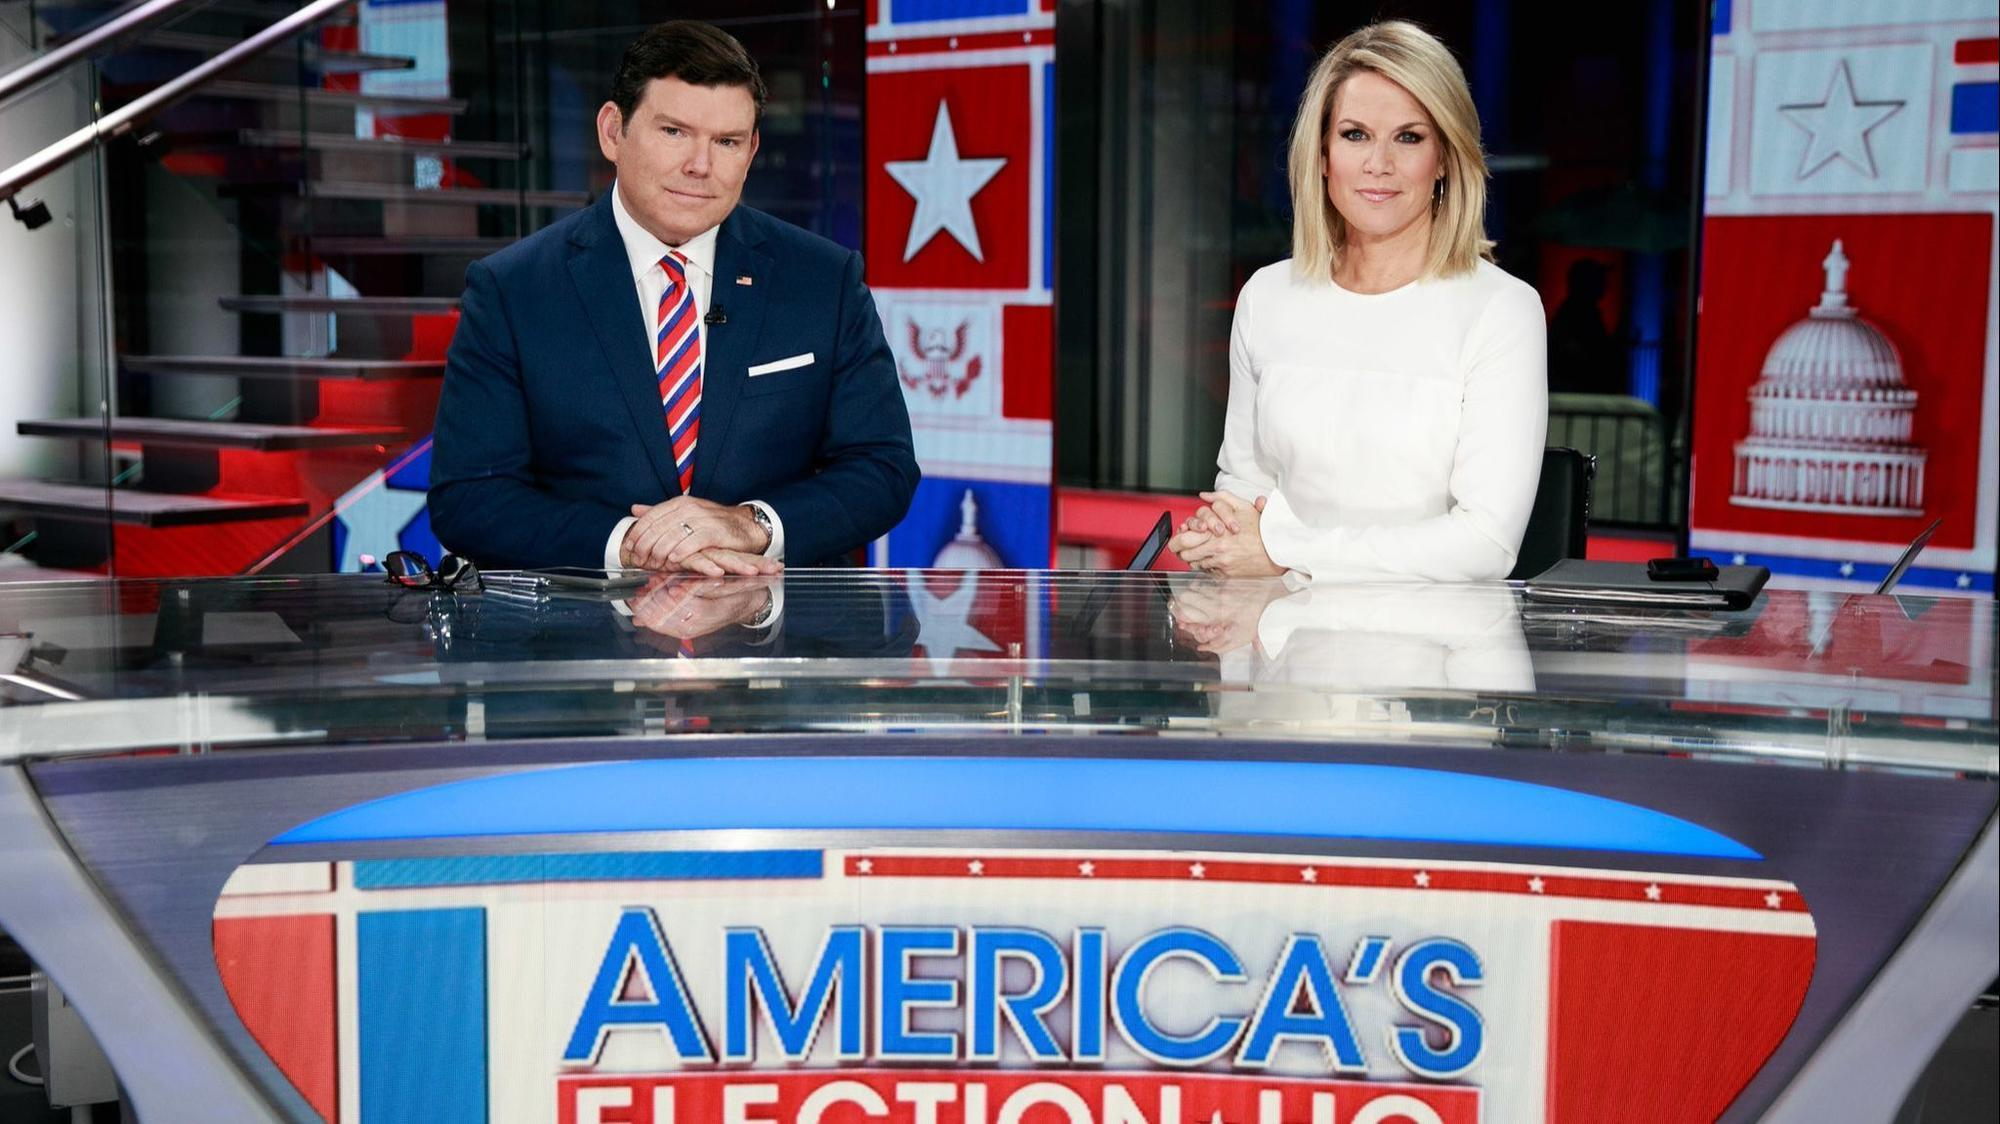 Fox News Host Harris Faulkner Shuts Down Guests for